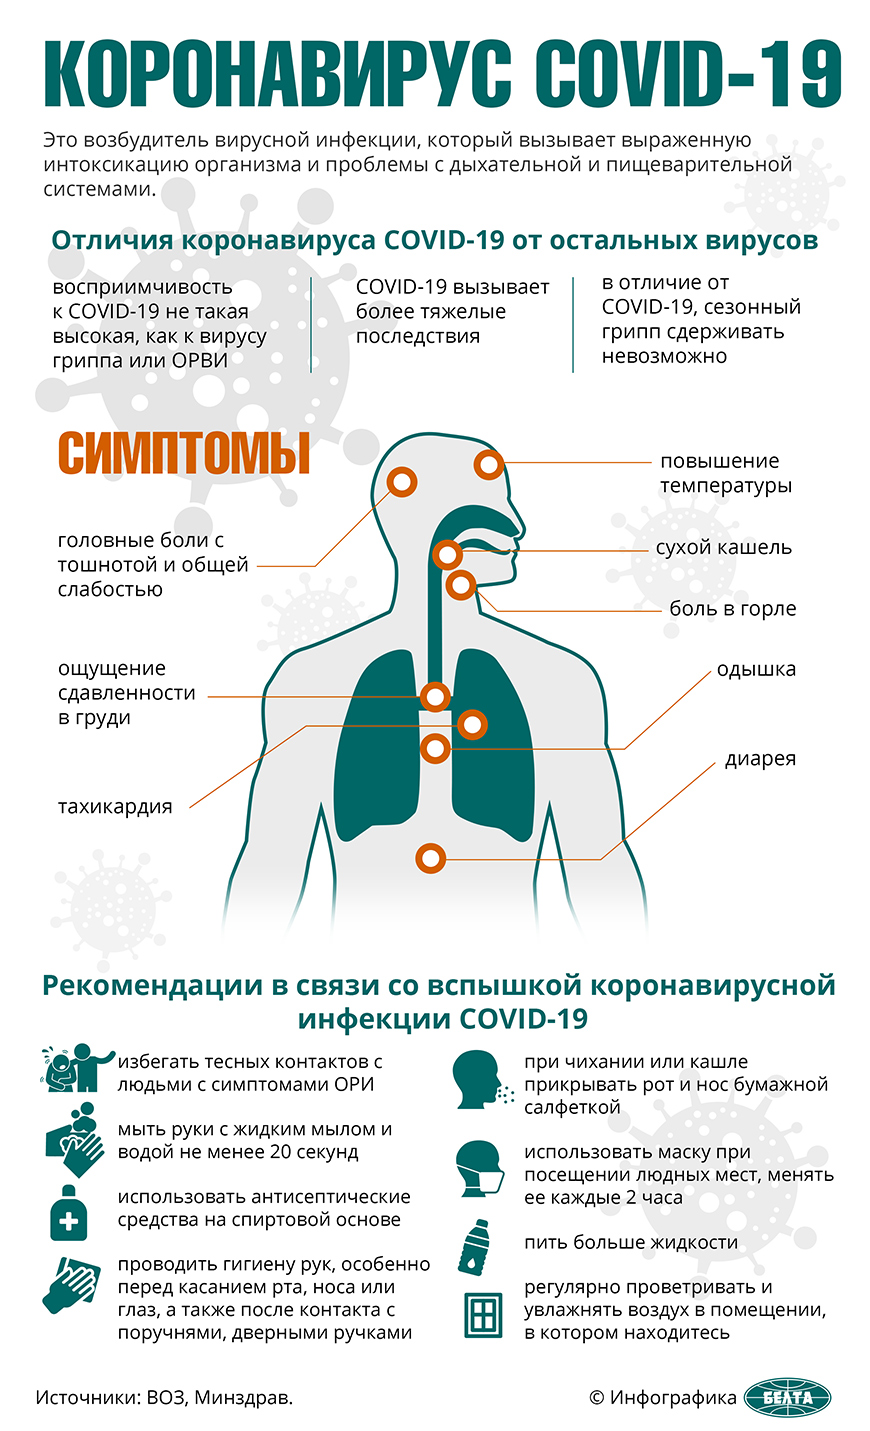 Минздрав: в Беларуси на 22 мая выздоровели и выписаны 12 833 пациента с COVID-19